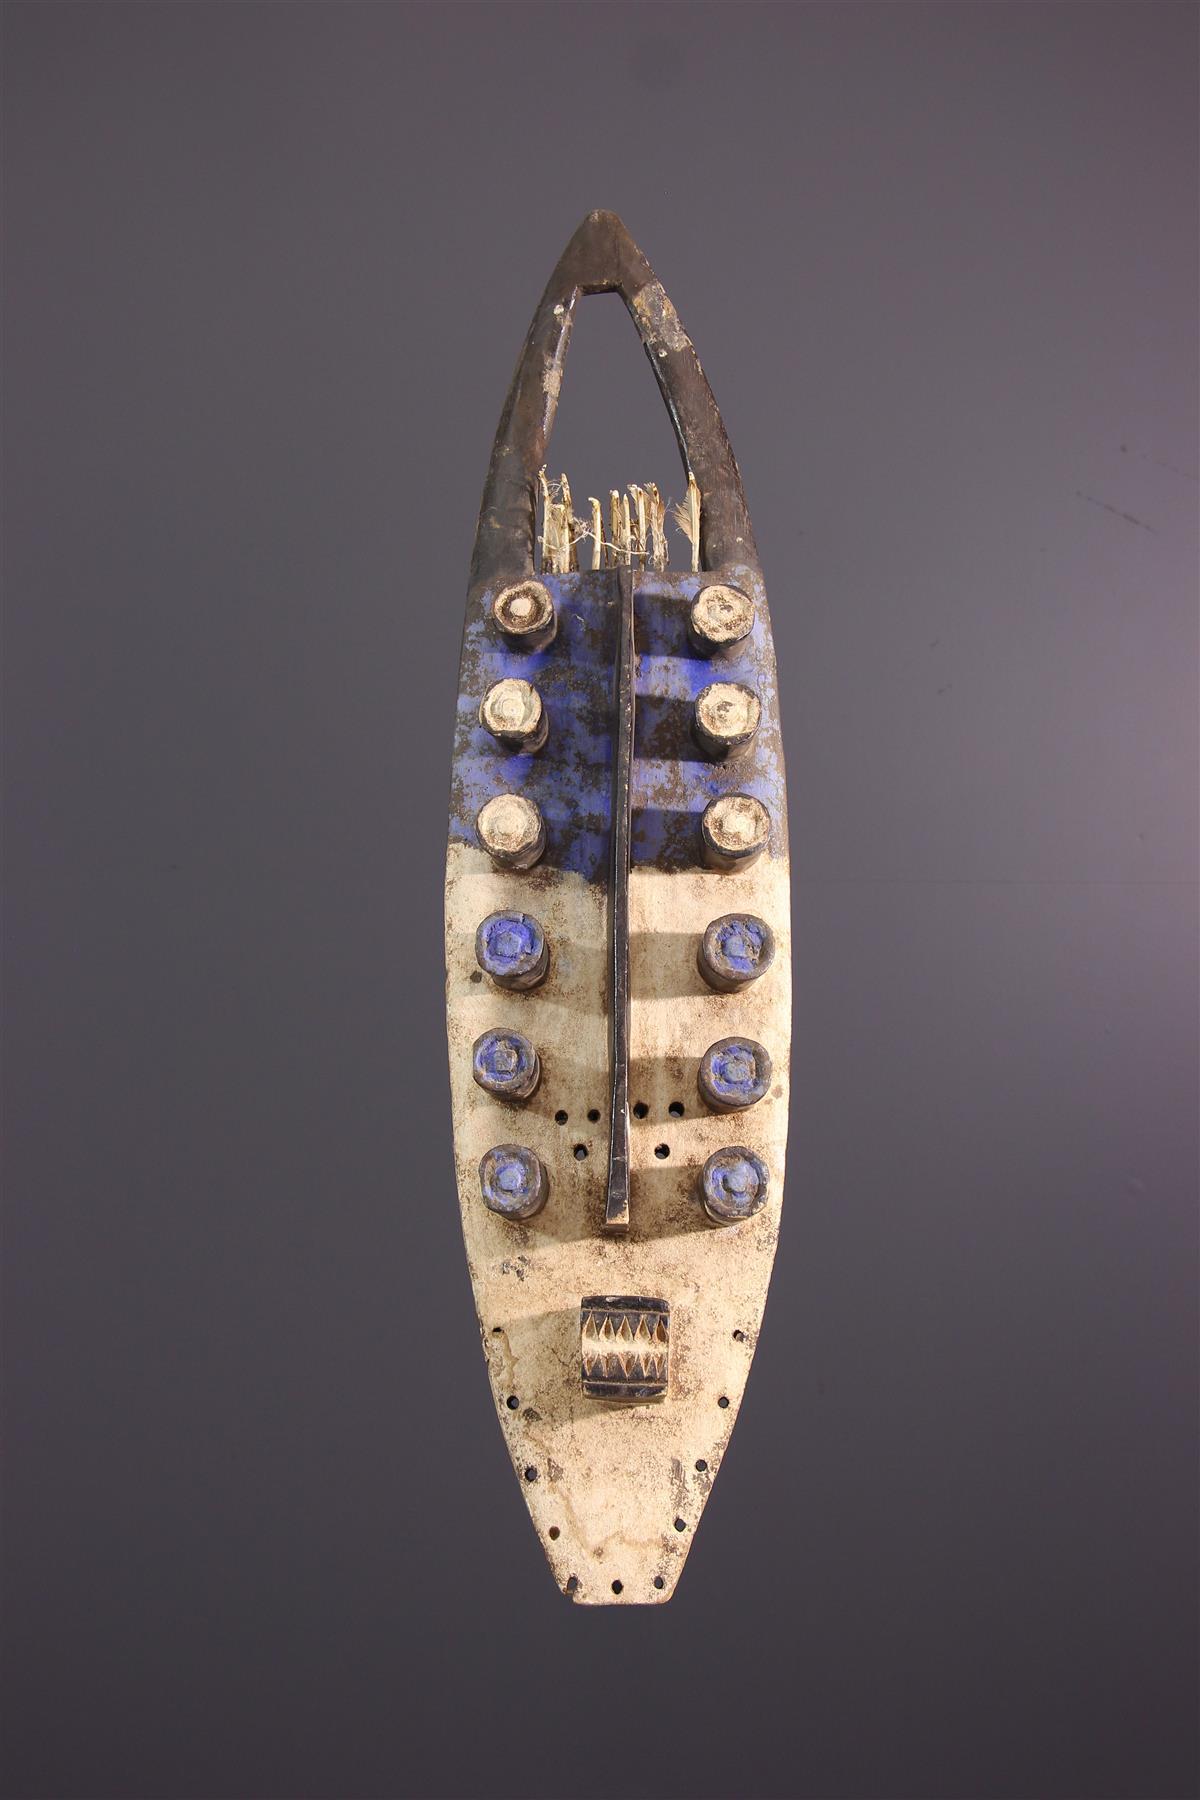 Kru Mask - Tribal art